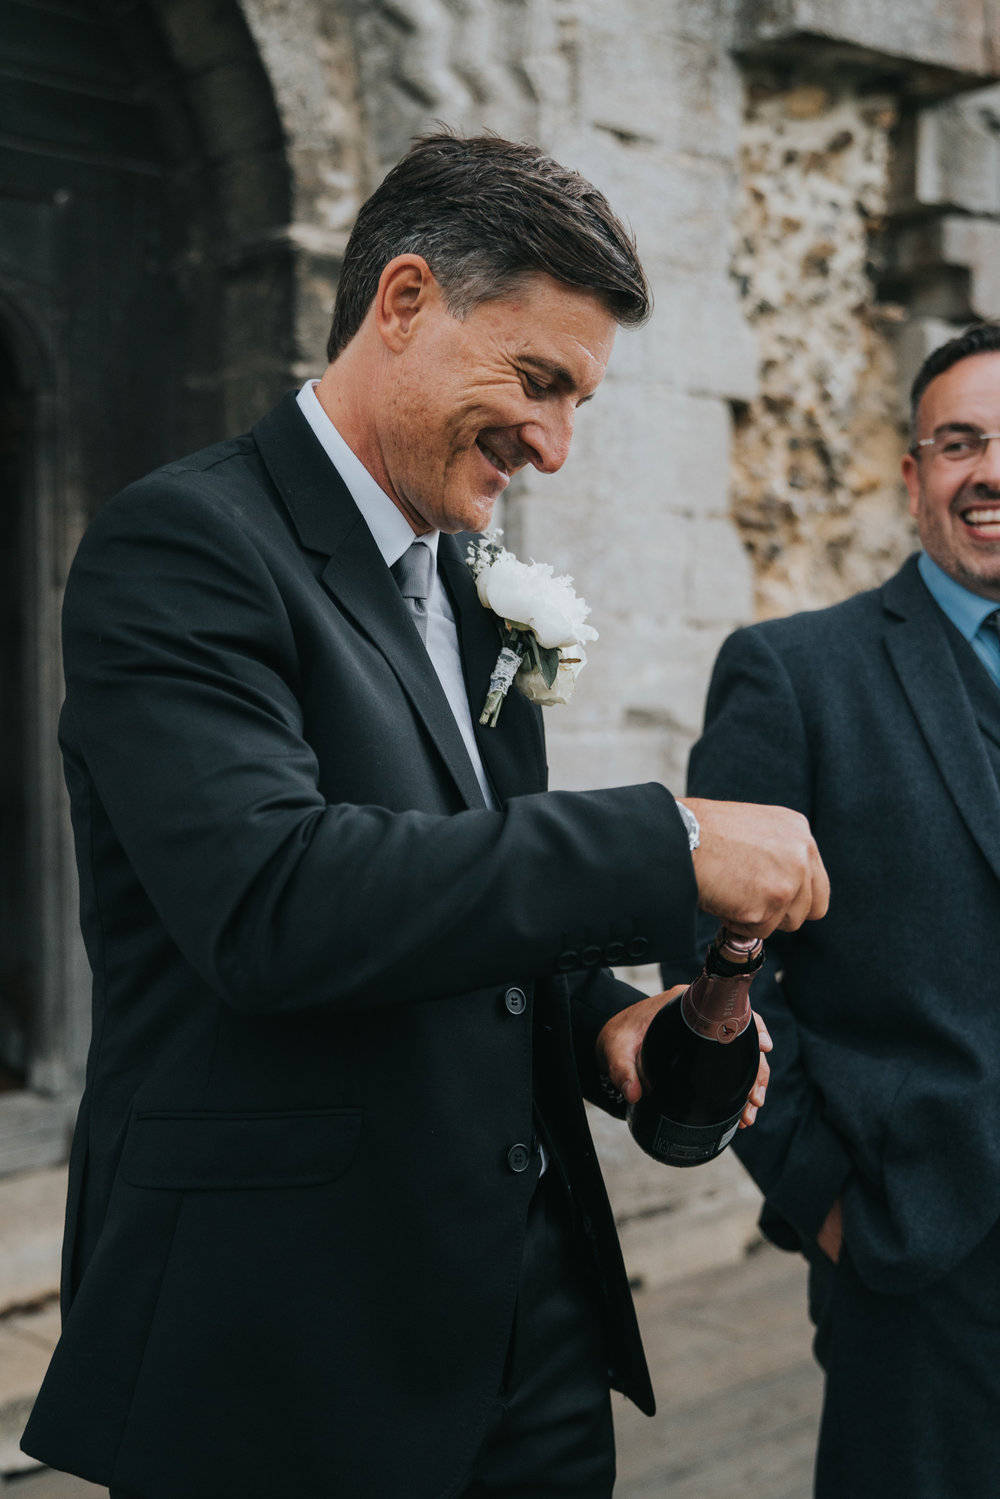 grace-elizabeth-boho-wedding-headingham-castle-essex-wedding-photographer-48.jpg